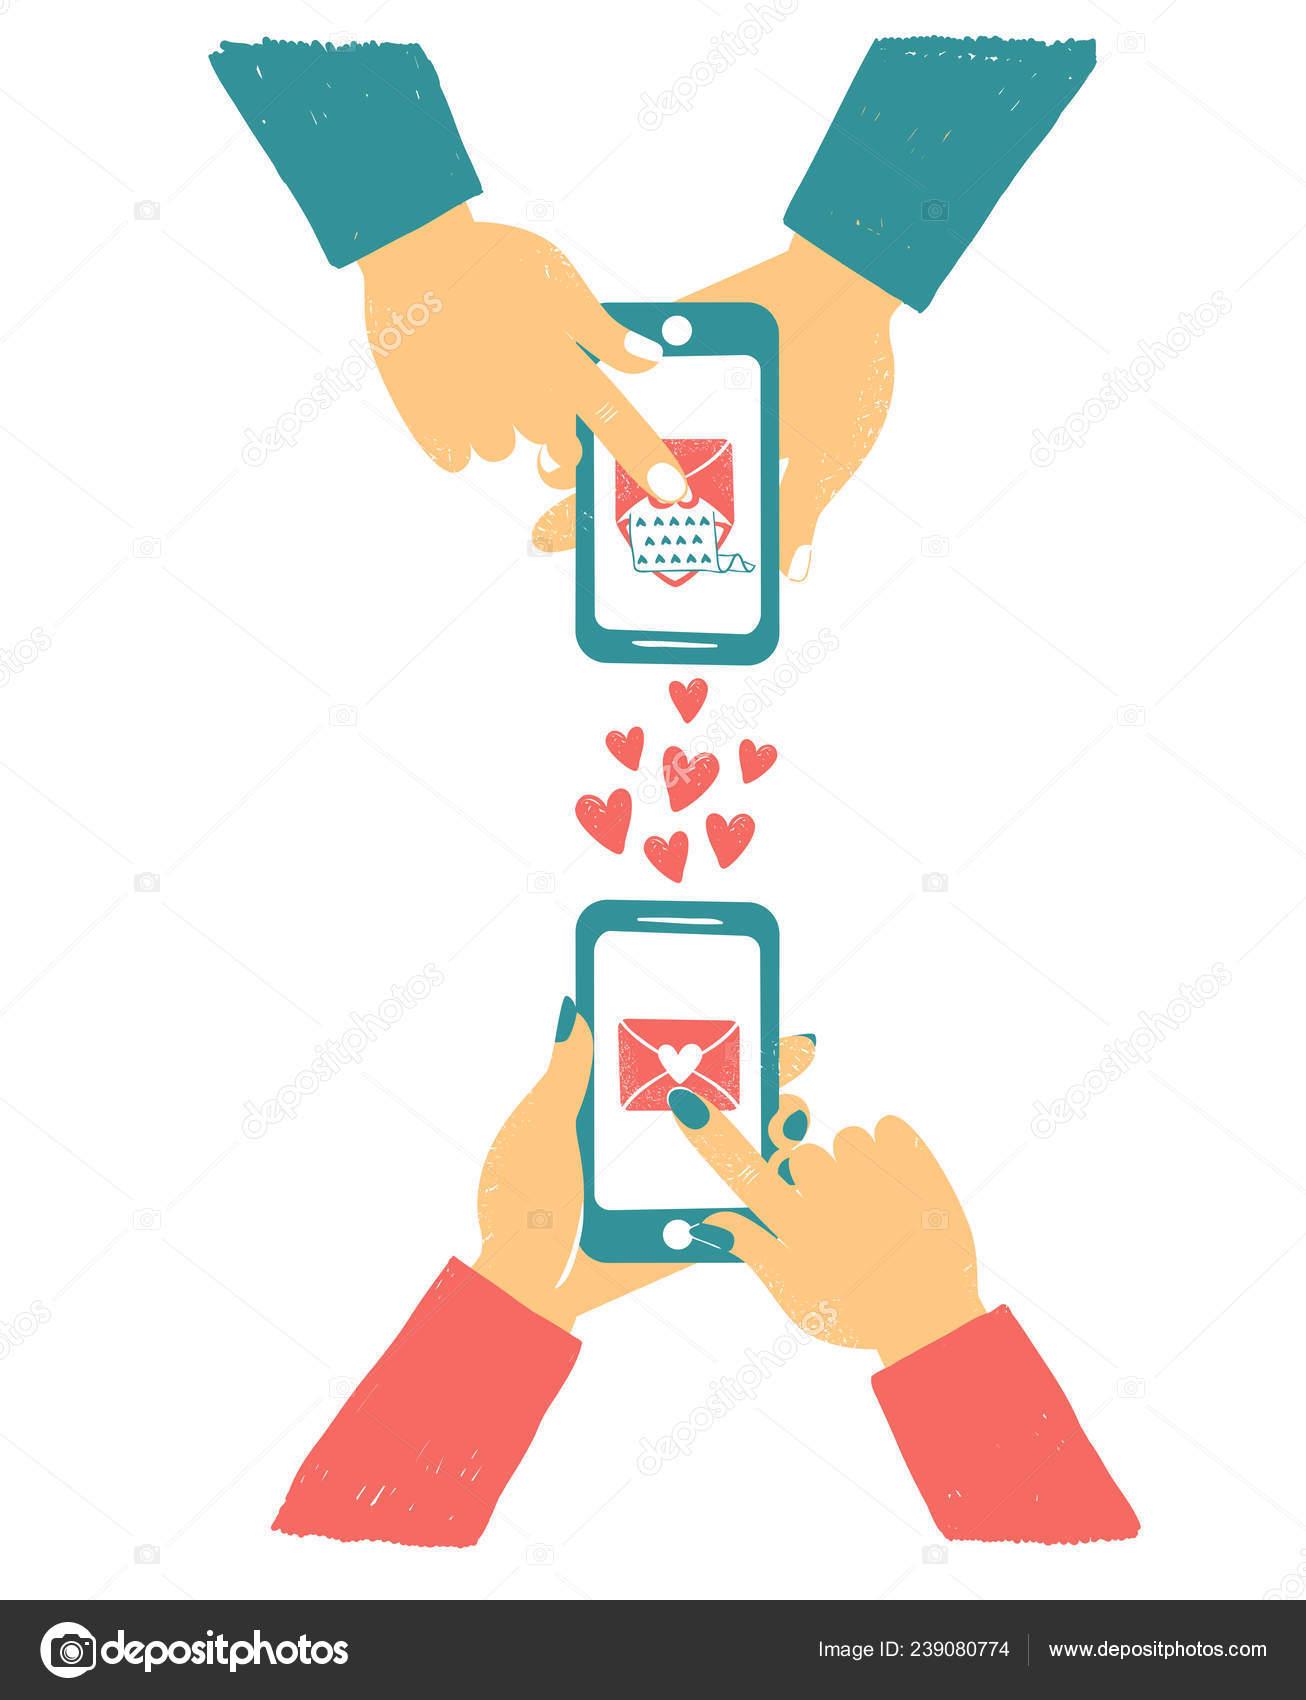 seks-chat-onlayn-cherez-telefon